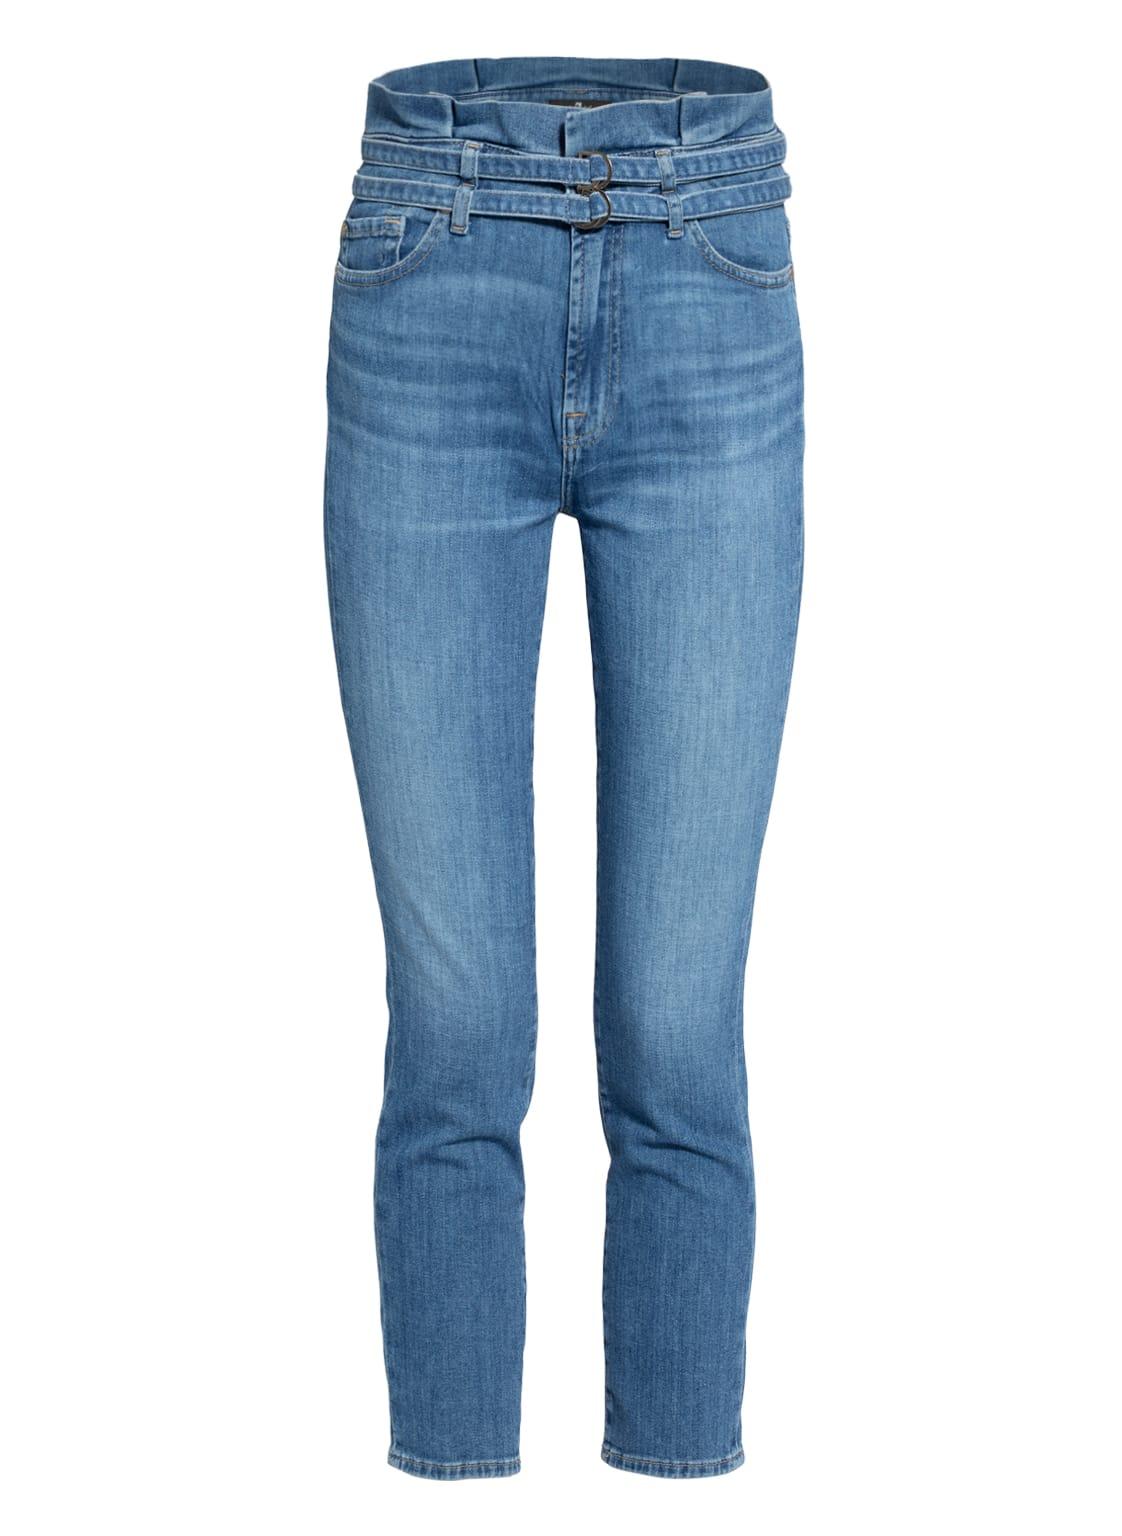 Image of 7 For All Mankind 7/8-Jeans Slim Paperbag blau